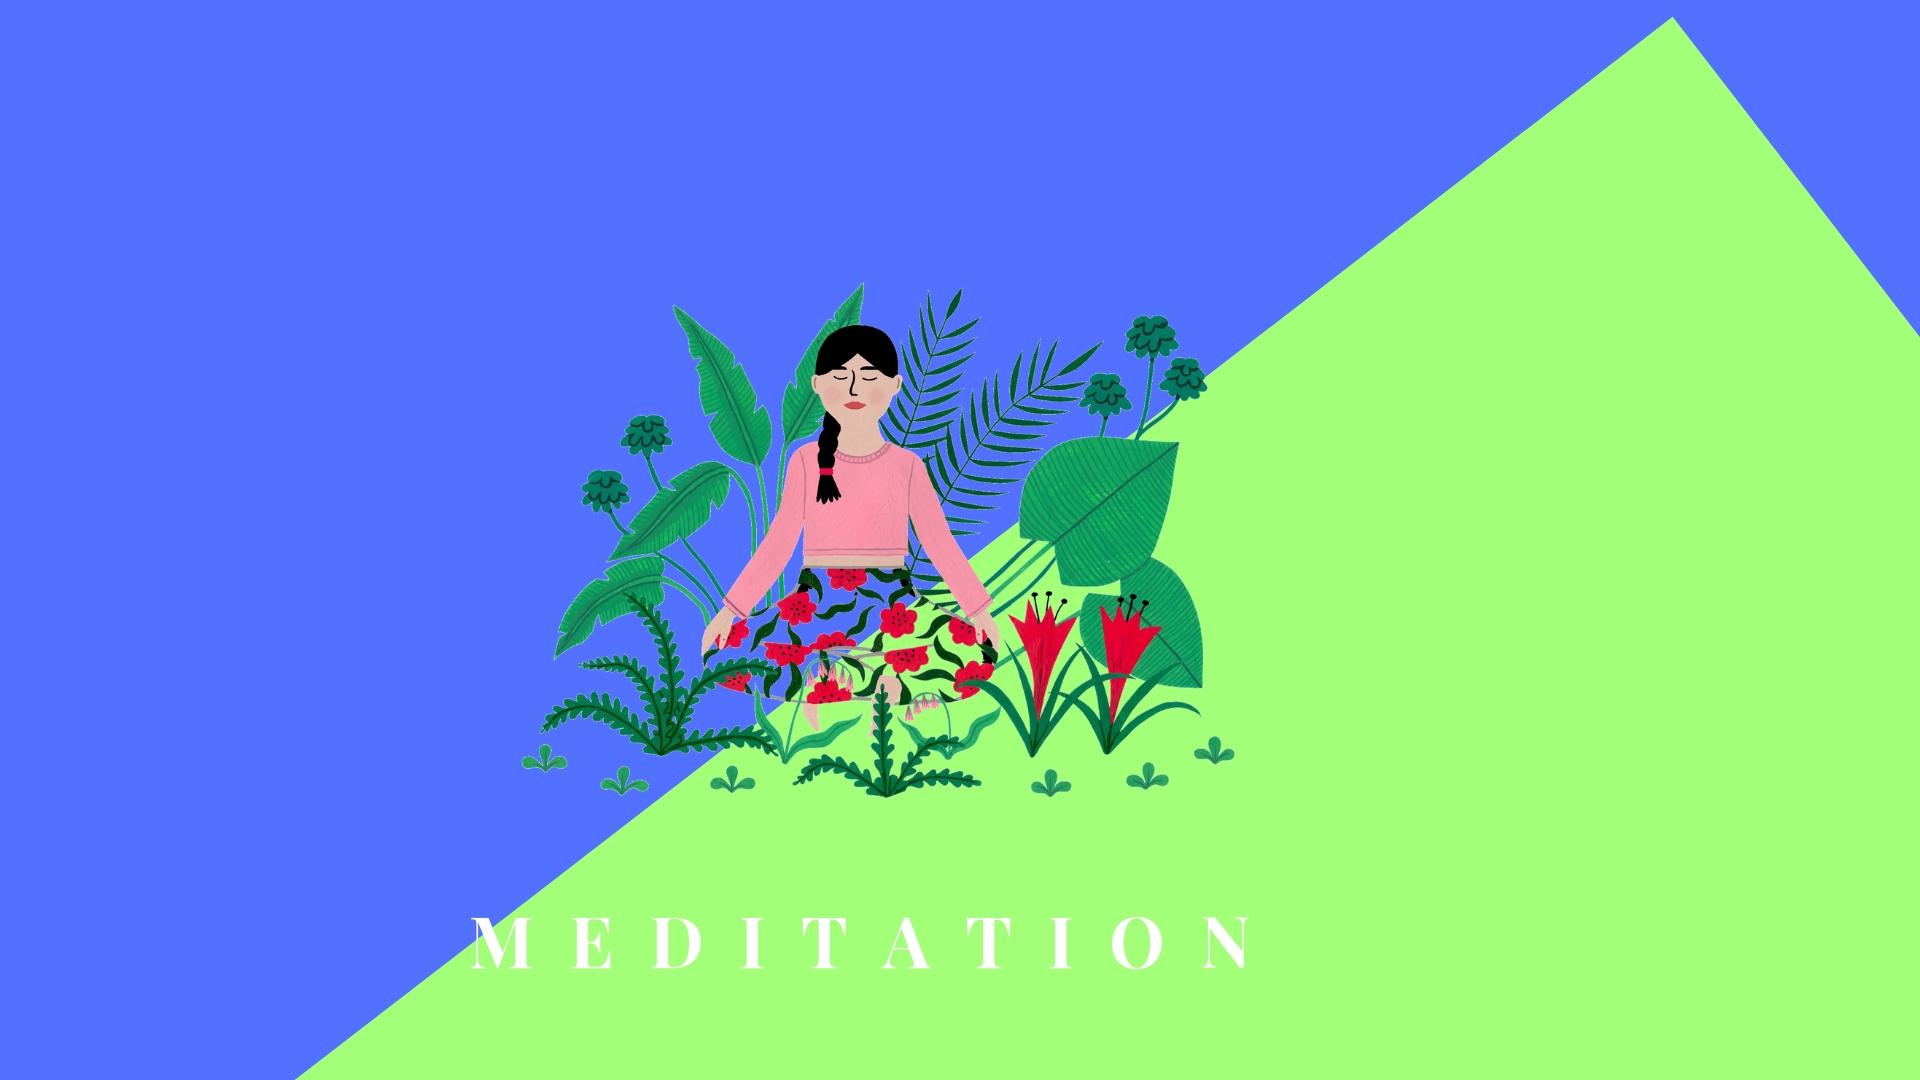 meditation - the edit.jpg